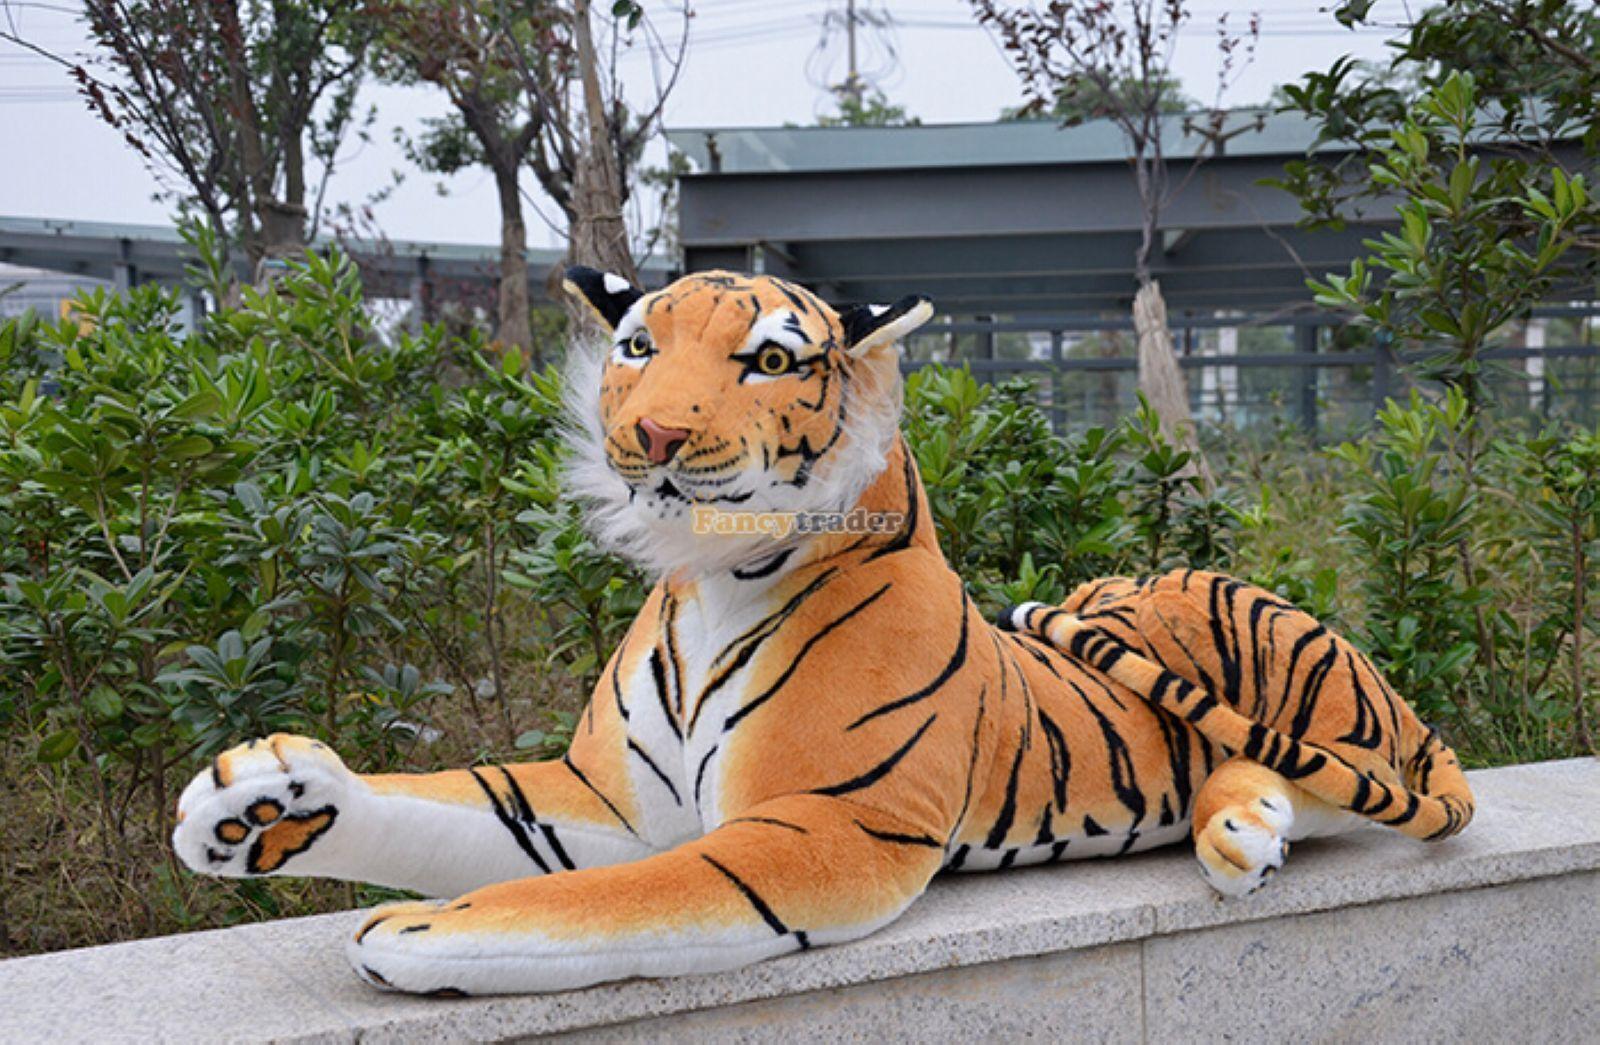 67'' Huge Giant Likelife Tiger Plush Stuffed Emulational Toys Animal doll gift